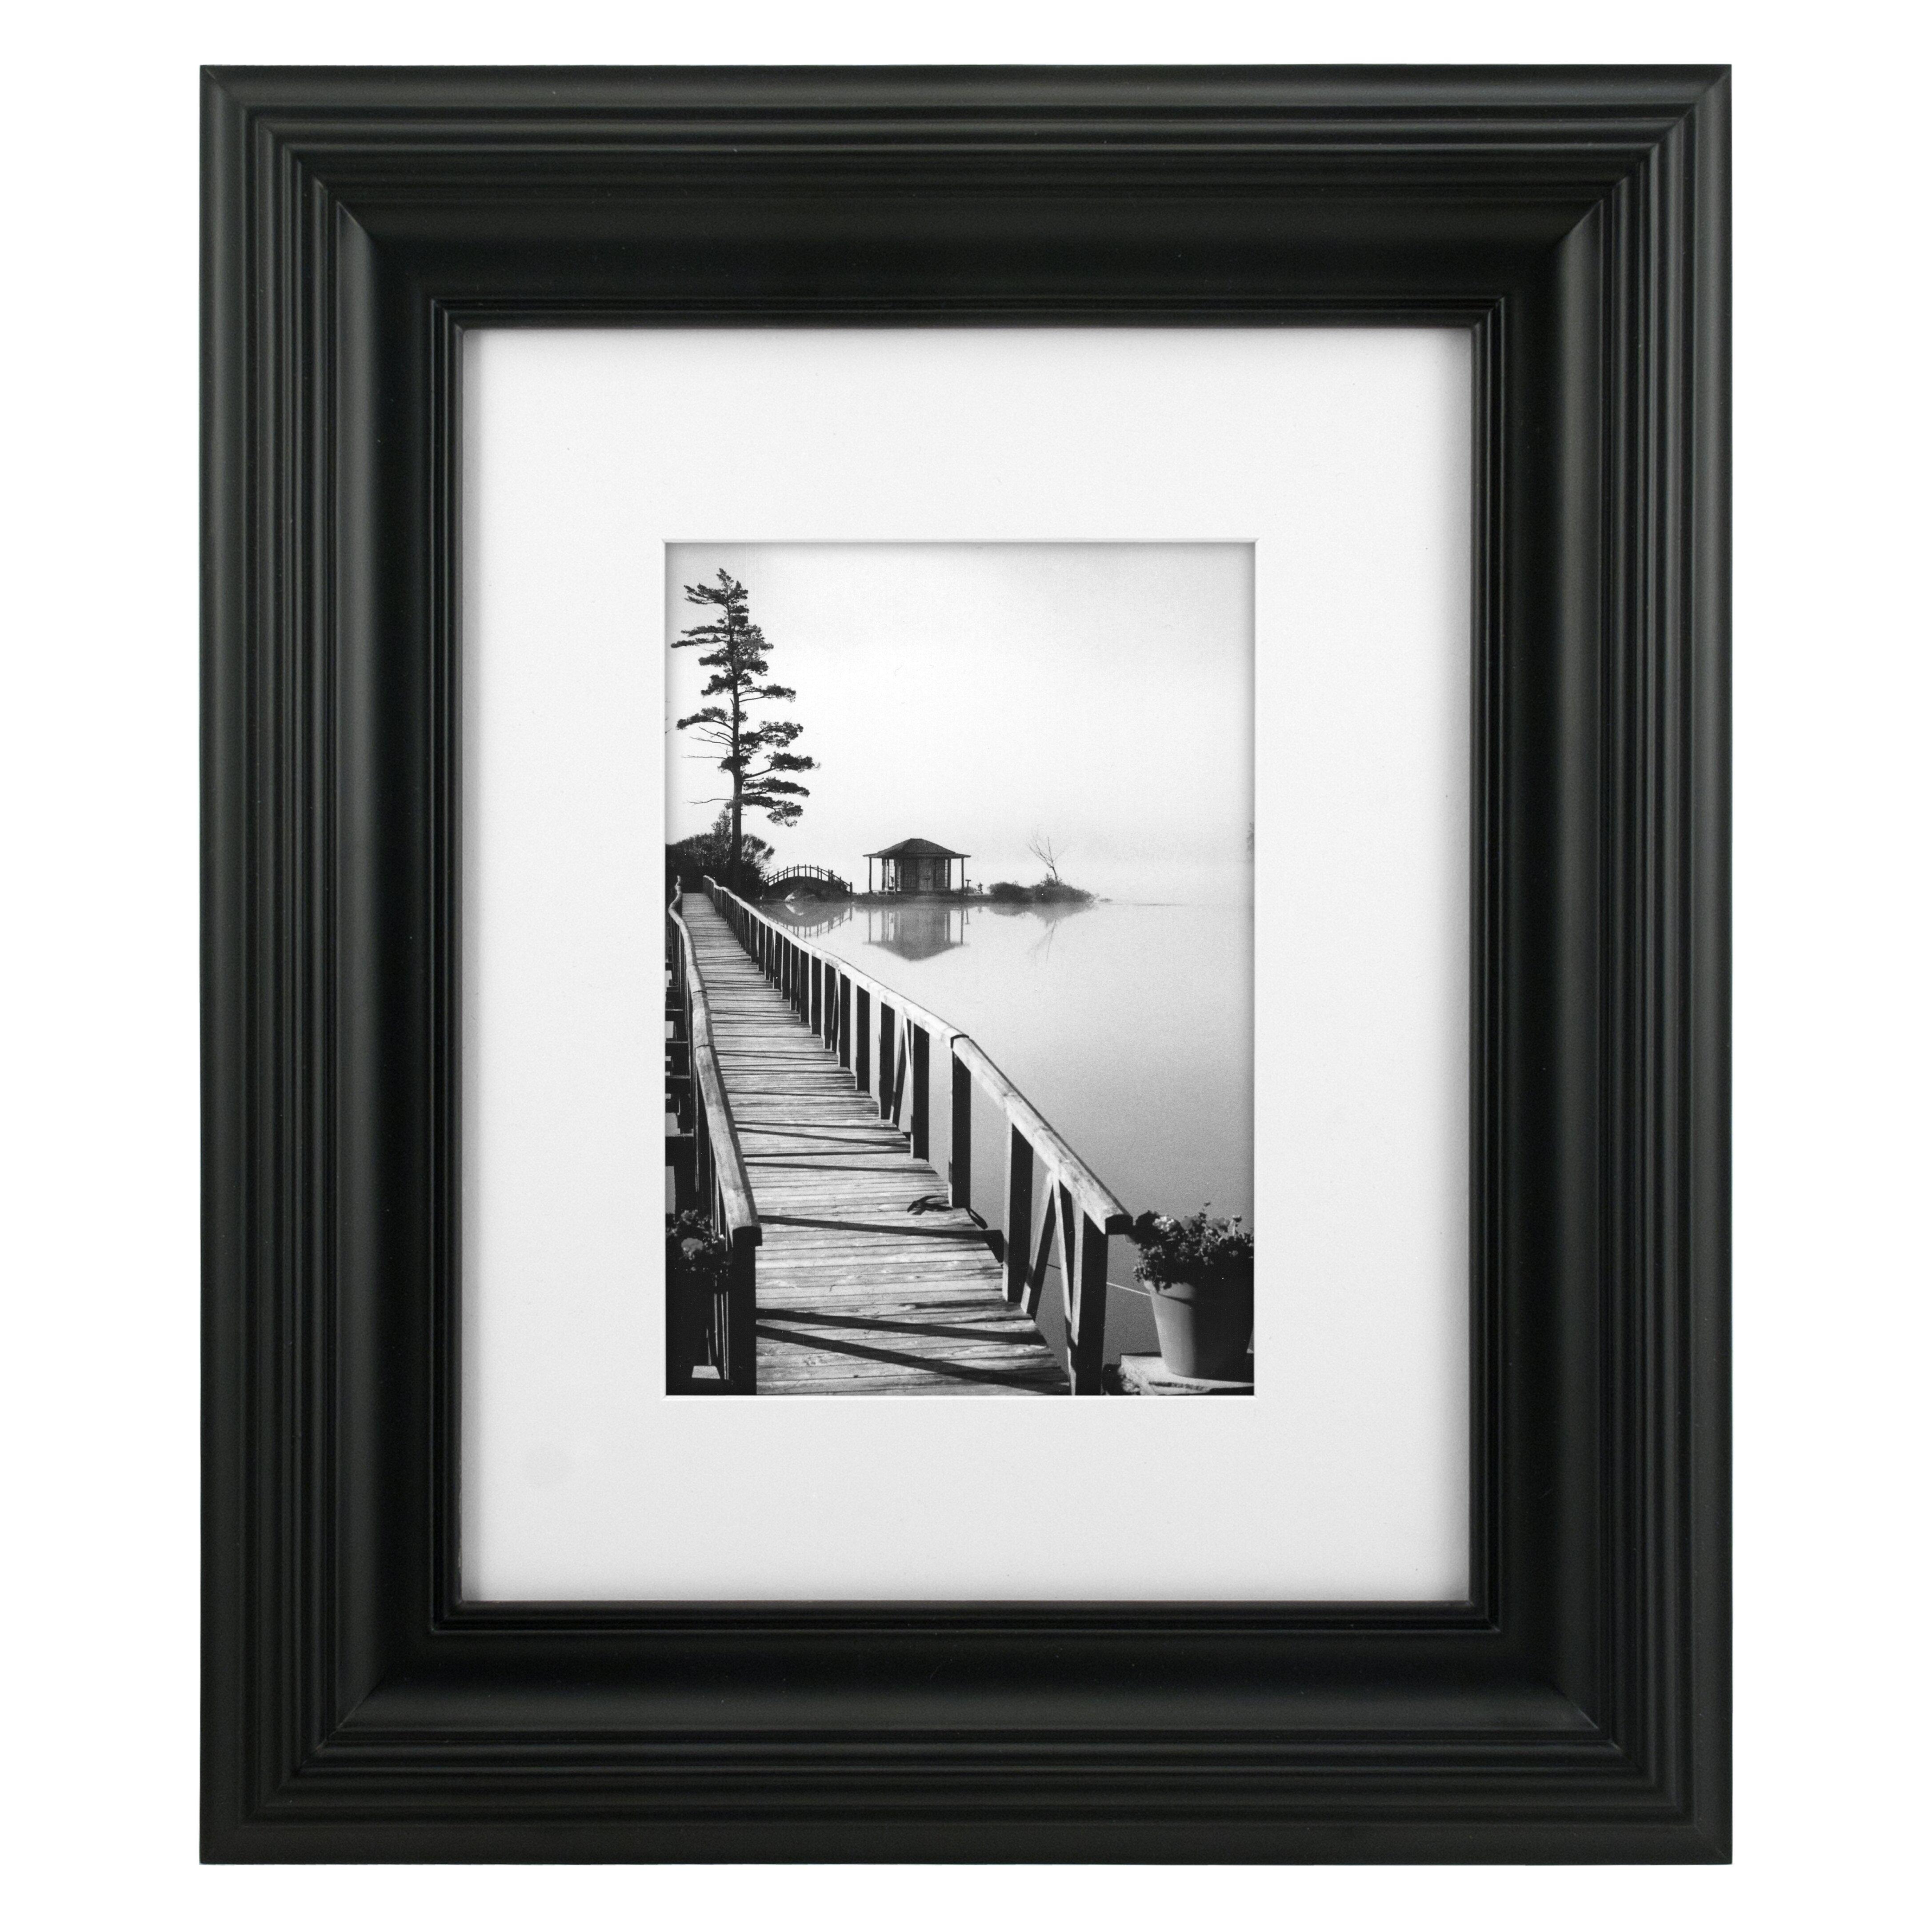 Malden Portrait Gallery Picture Frame Amp Reviews Wayfair